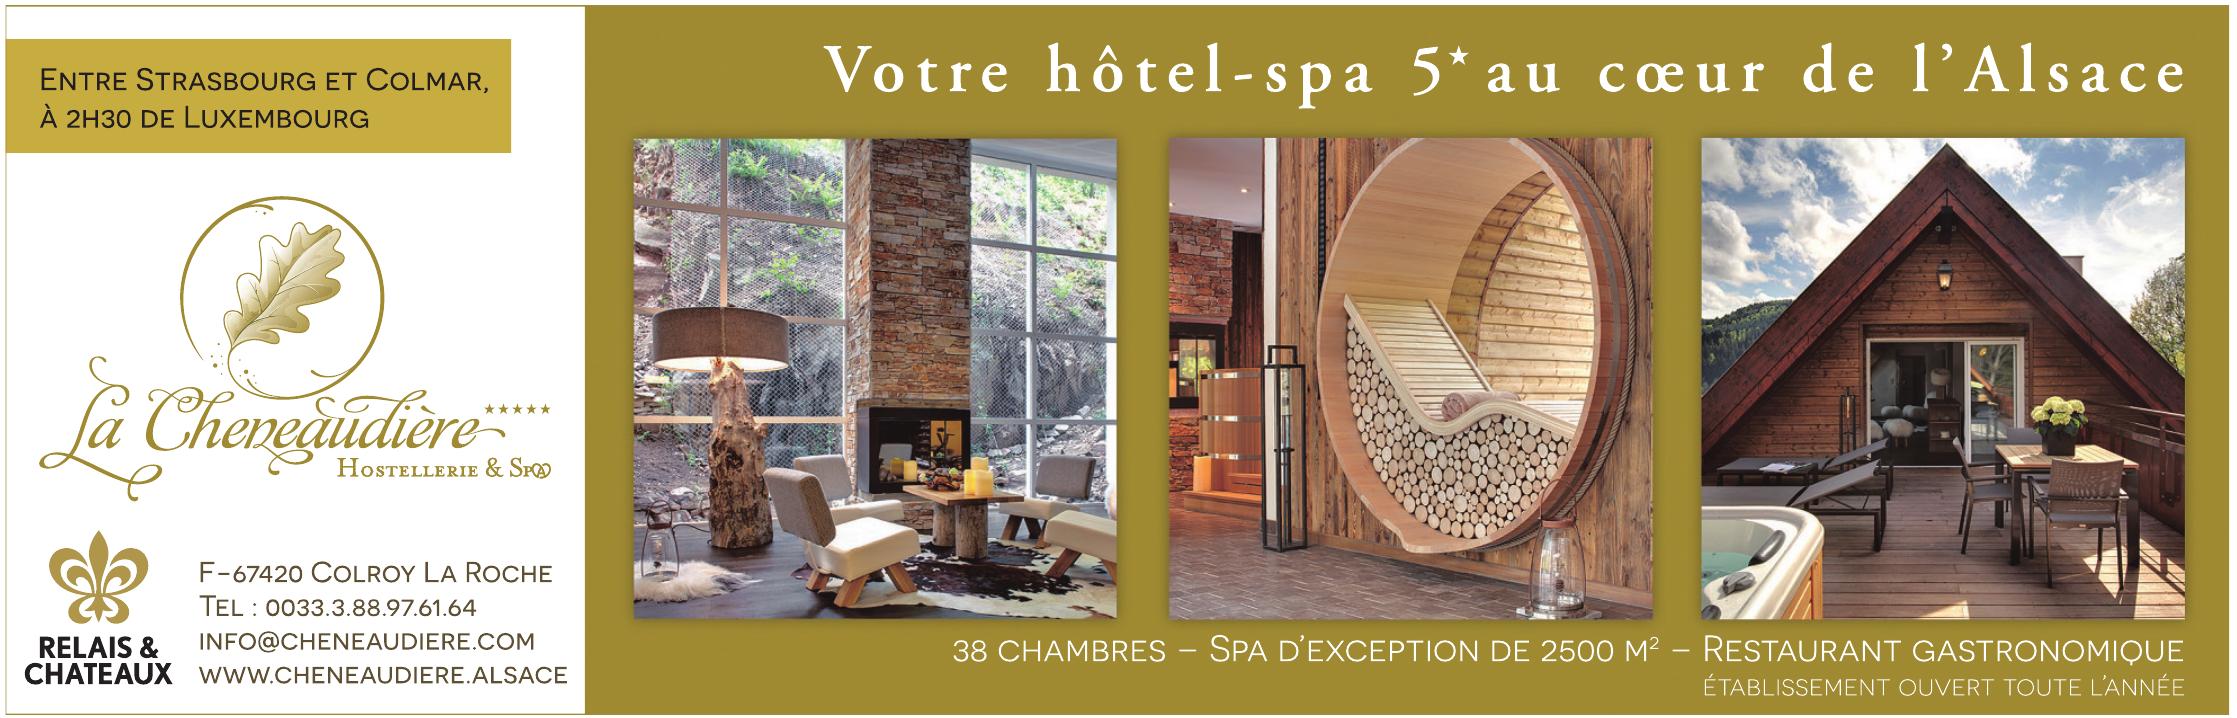 Hostellerie La Cheneaudiere & Spa